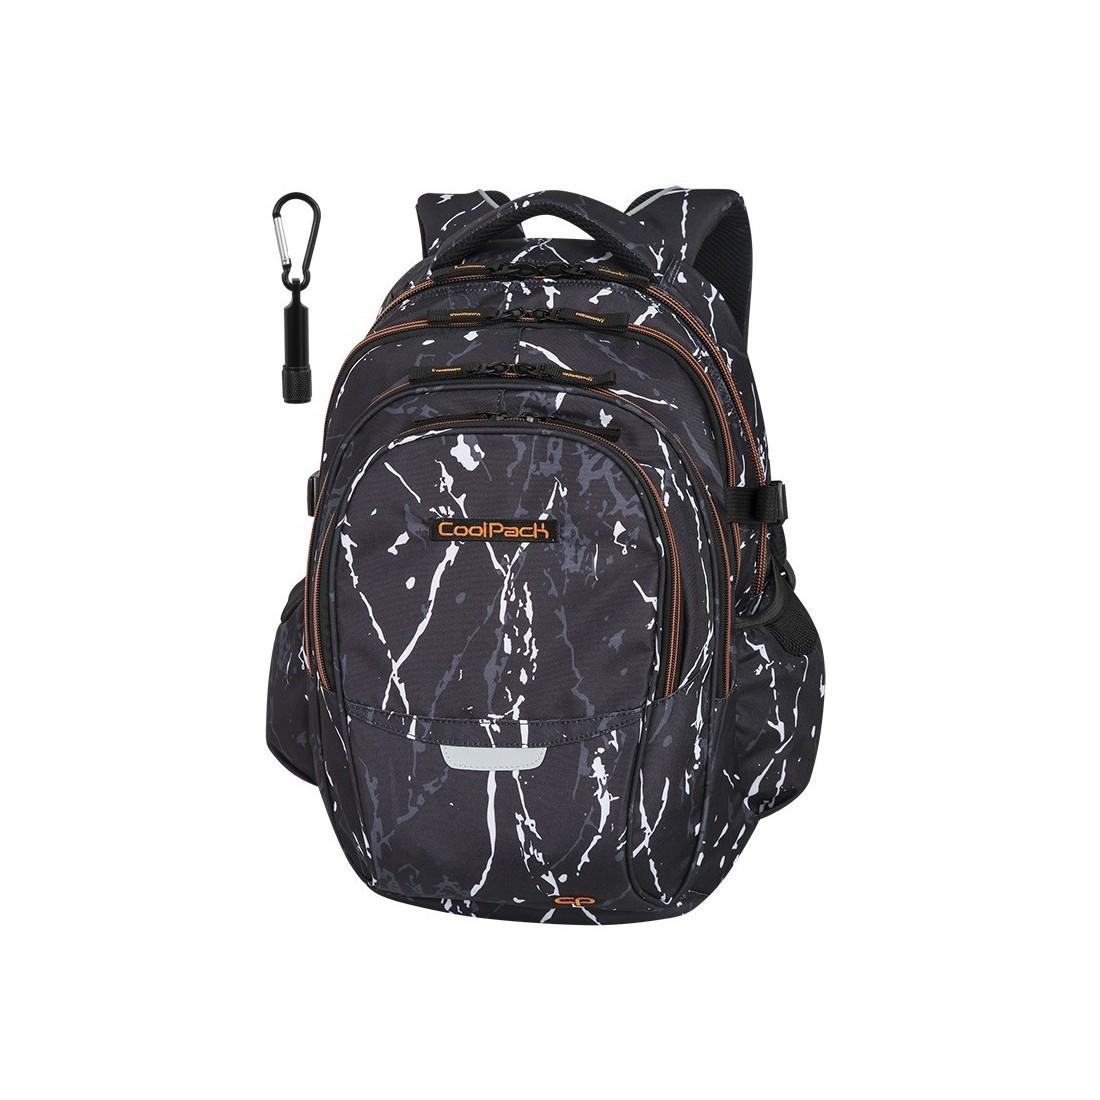 899c8eab0 Plecak szkolny CoolPack CP FACTOR BLACK MARBLE czarny marmur dla chłopaków  - 4 przegrody - A073